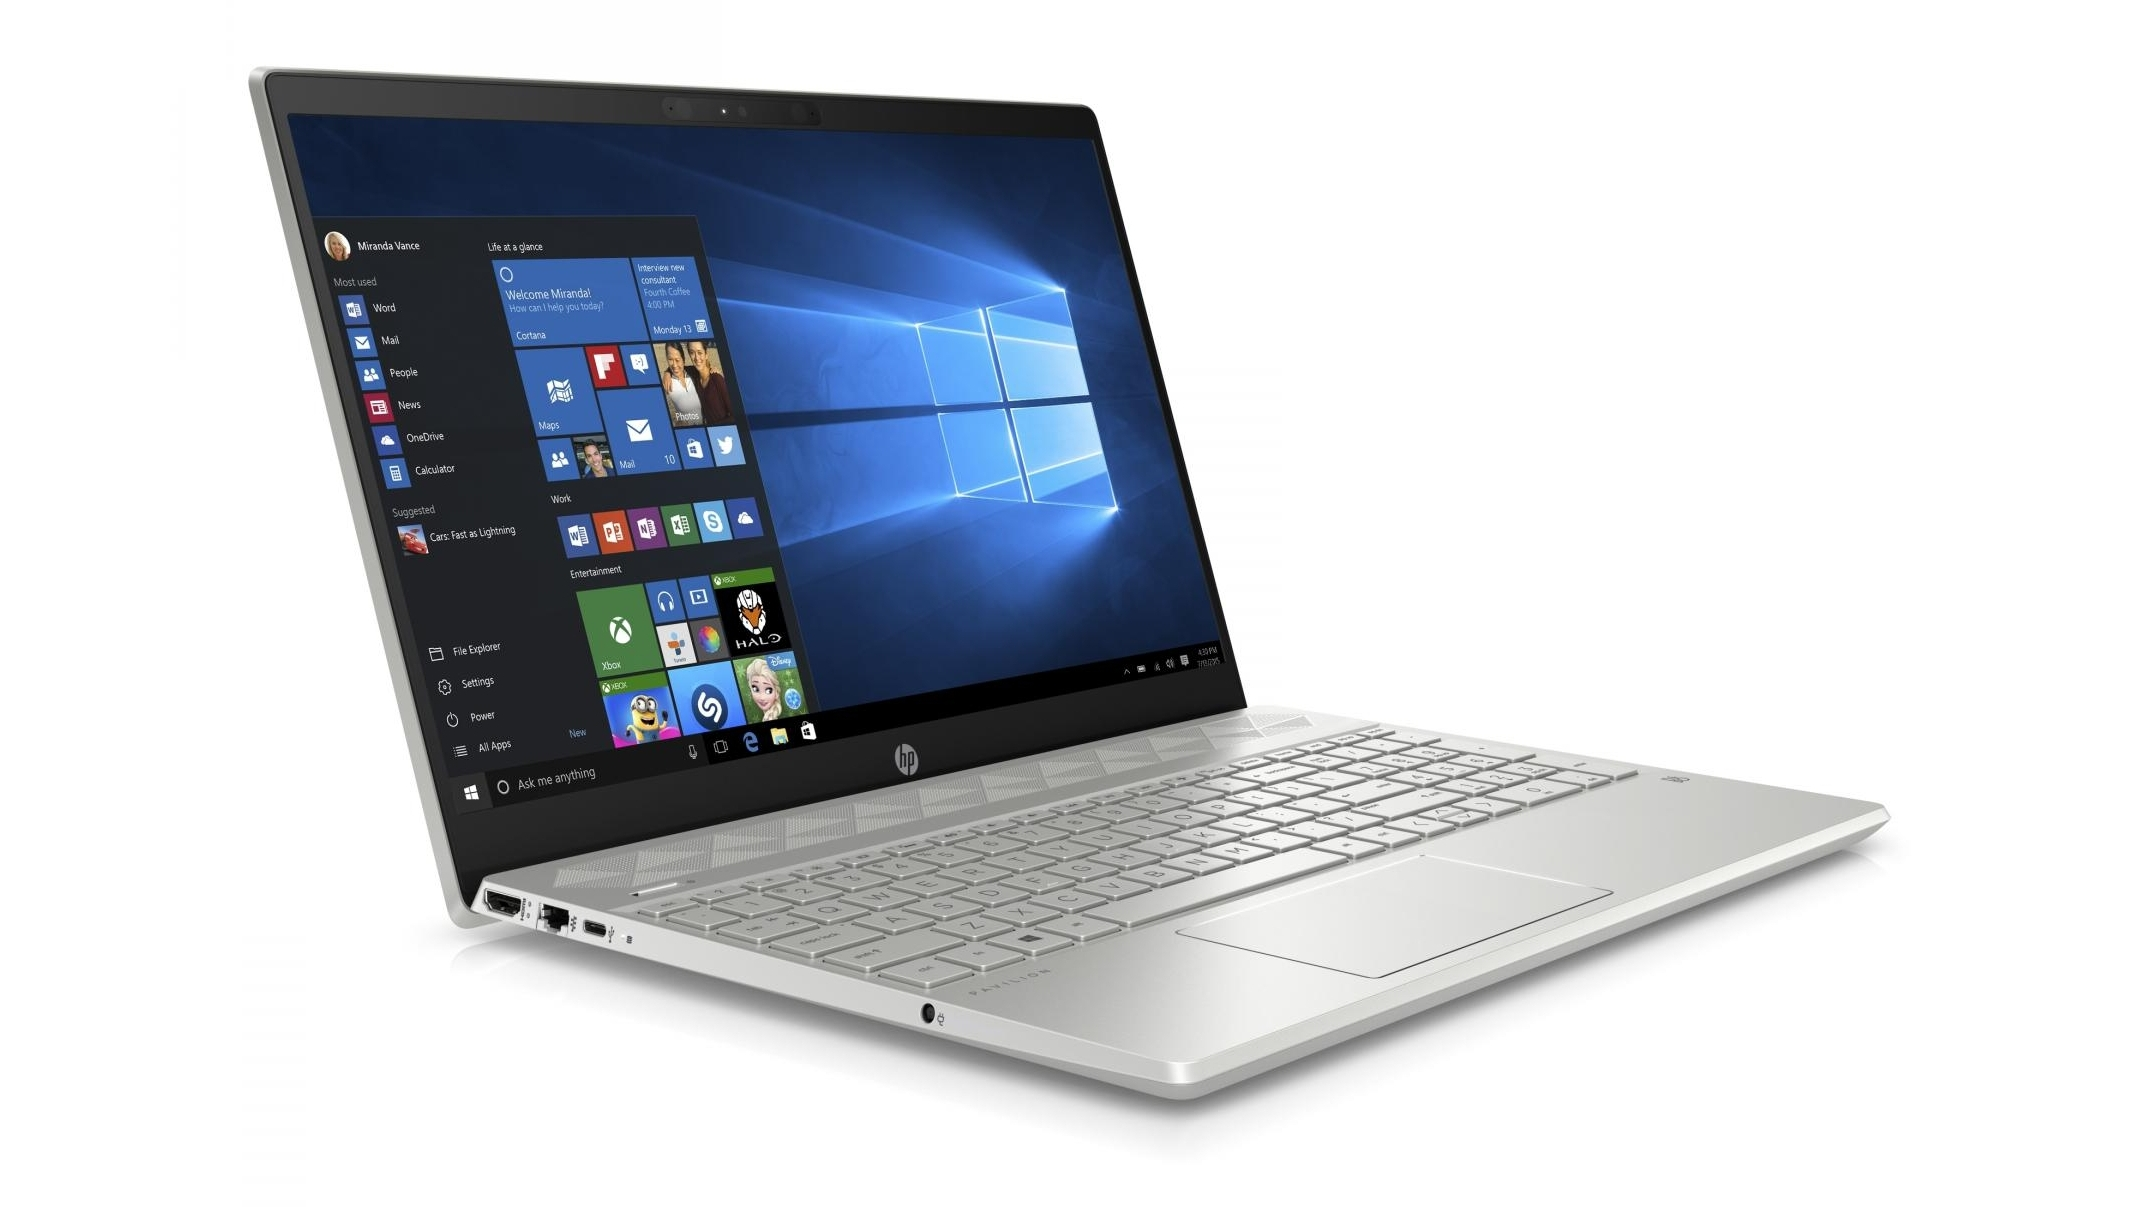 HP Pavilion 15 Touchscreen Cs0053cl I5-8th Gen